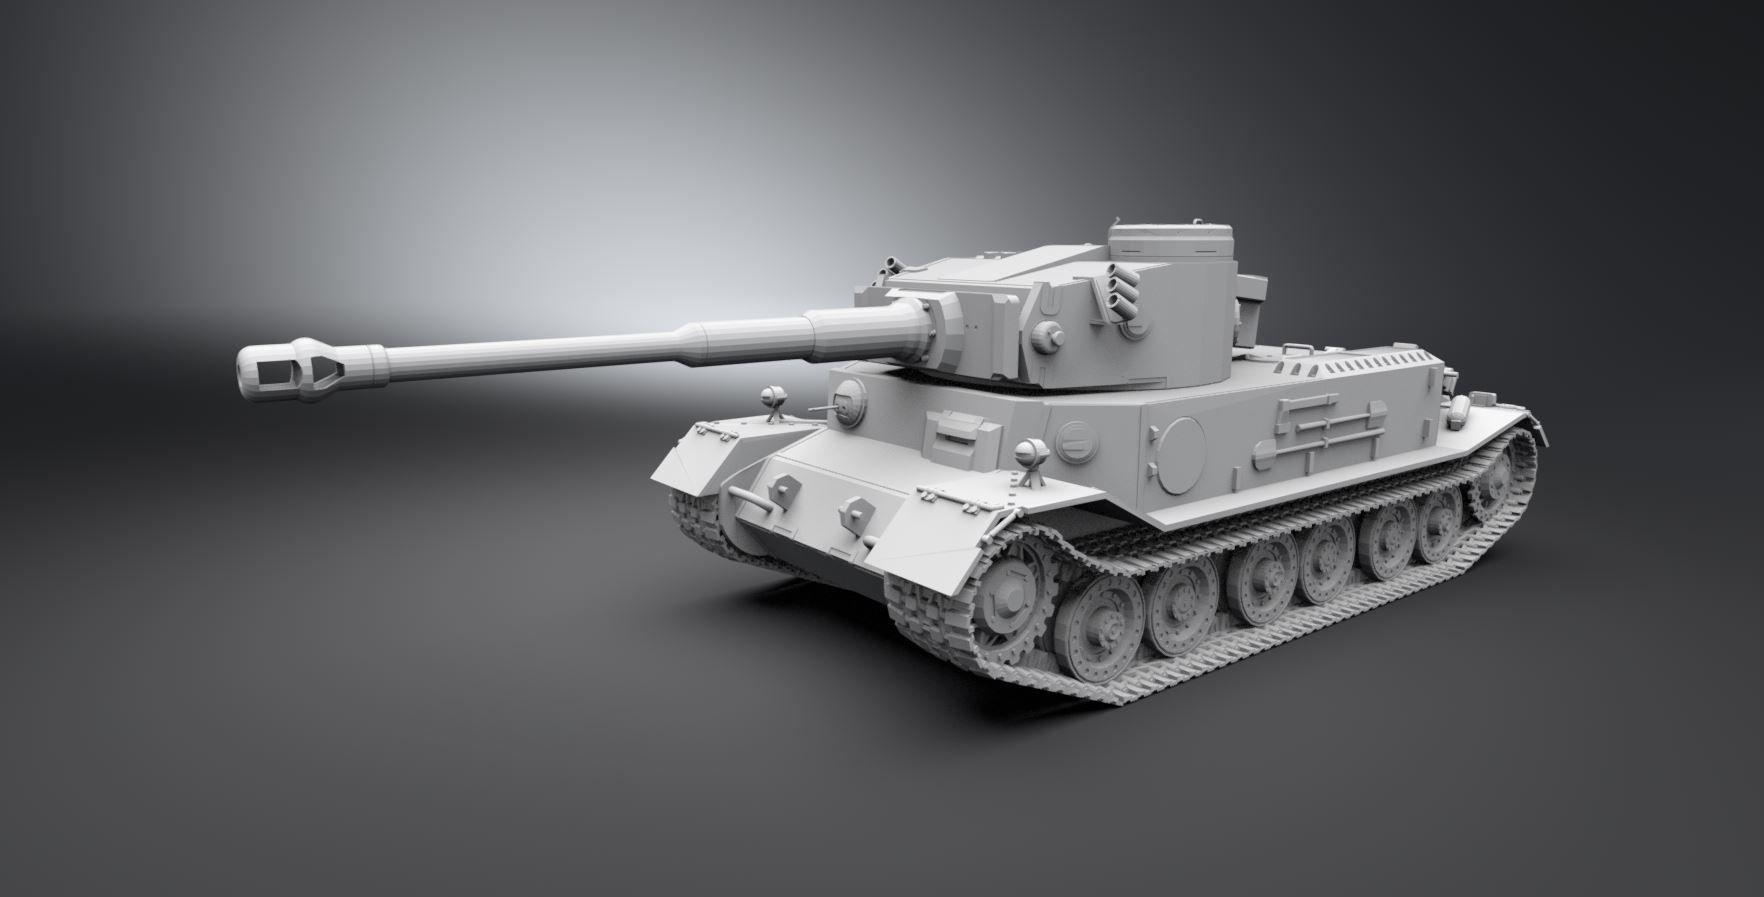 Vk 4501 Tiger Scale model